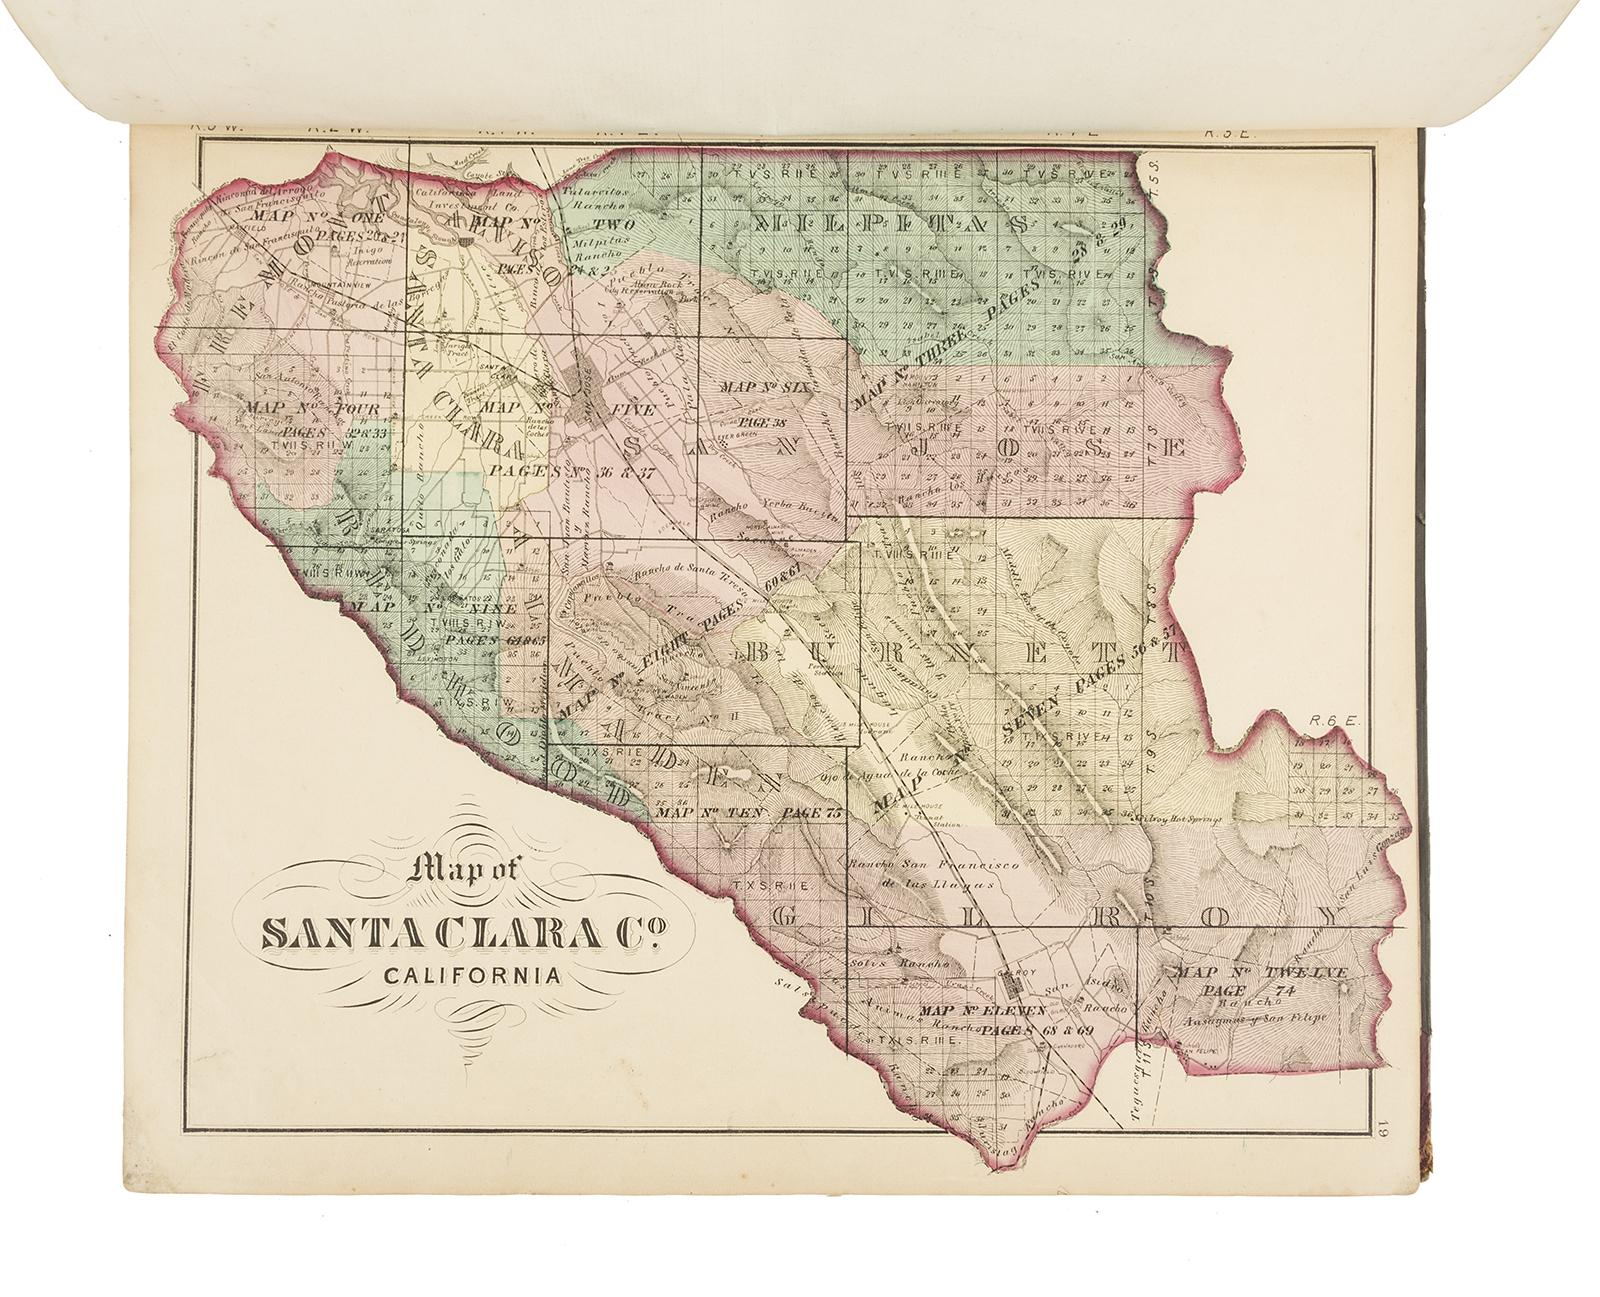 Historical Atlas Map of Santa Clara County, California - Price ... on